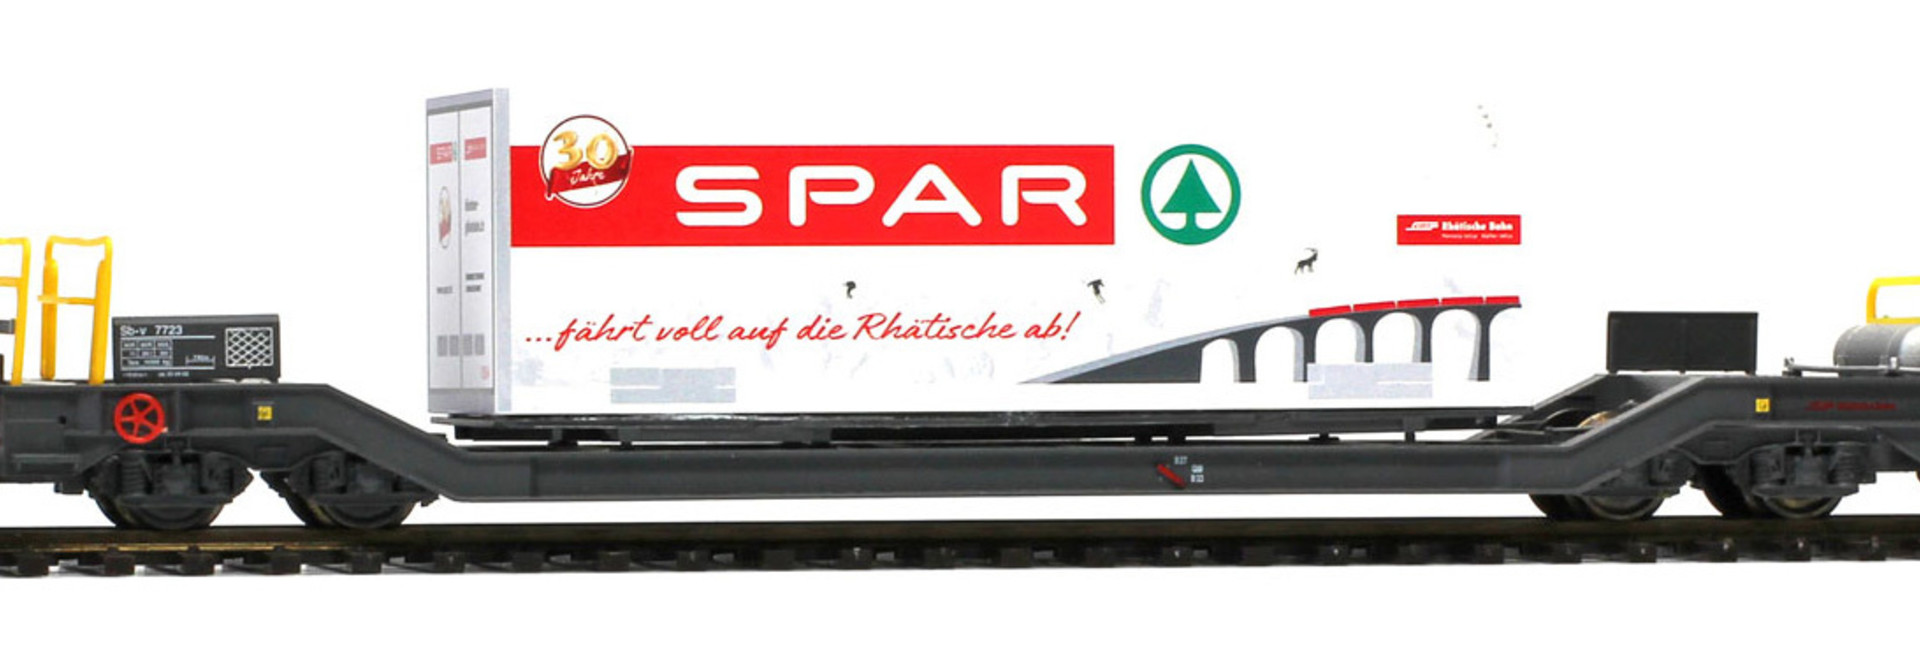 "2289110 RhB Sb-v 7730 mit Container ""Spar Berge"" 125 B"